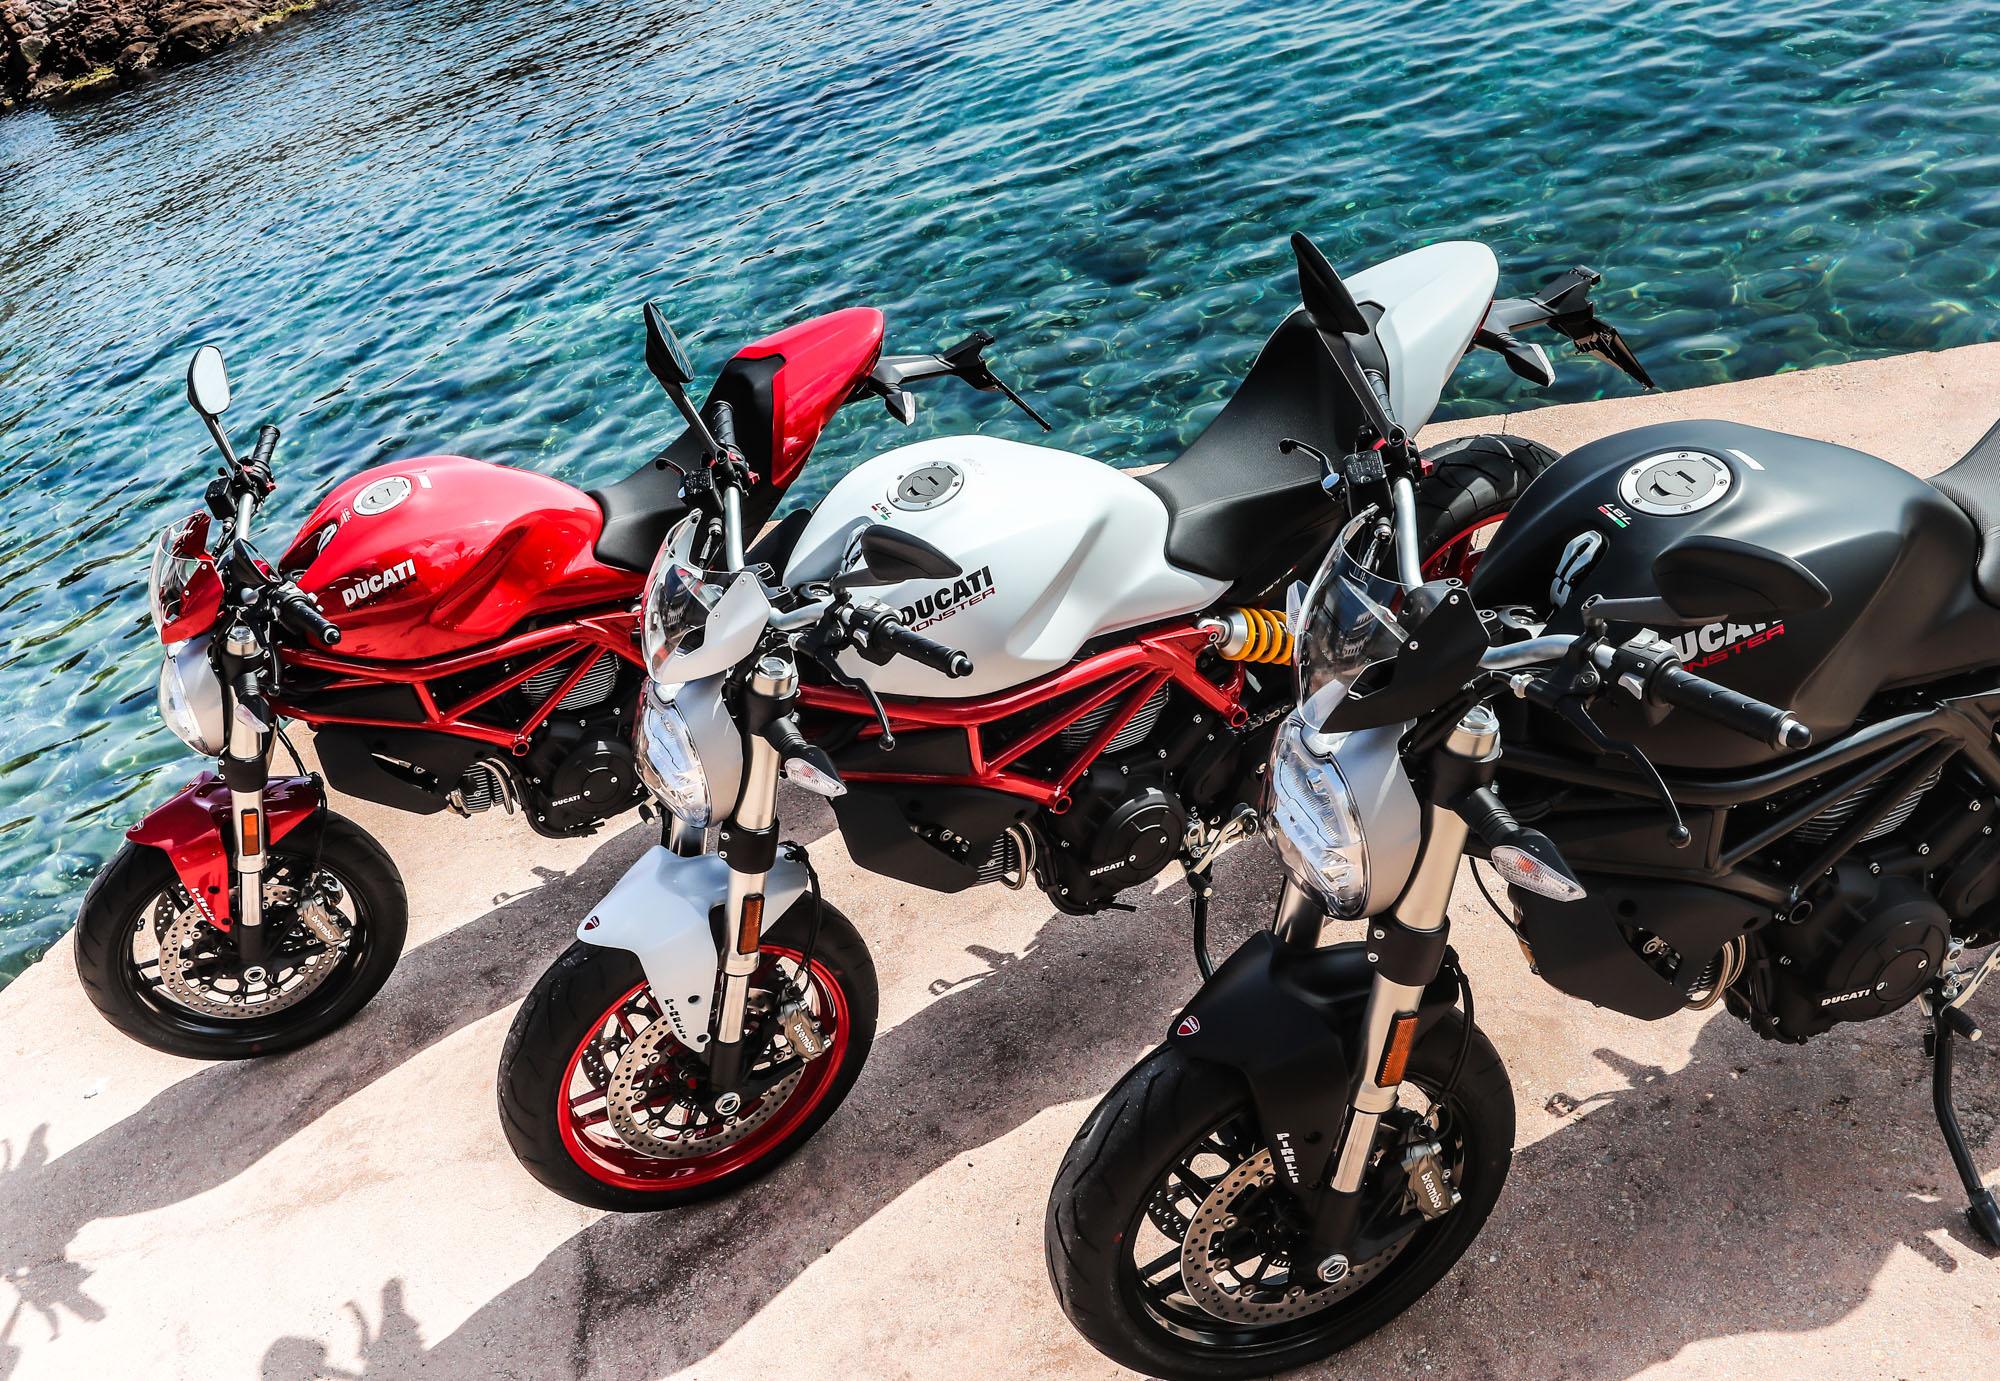 La Shiver 900 d'Aprilia et la Monster 797 Ducati : petit aperçu